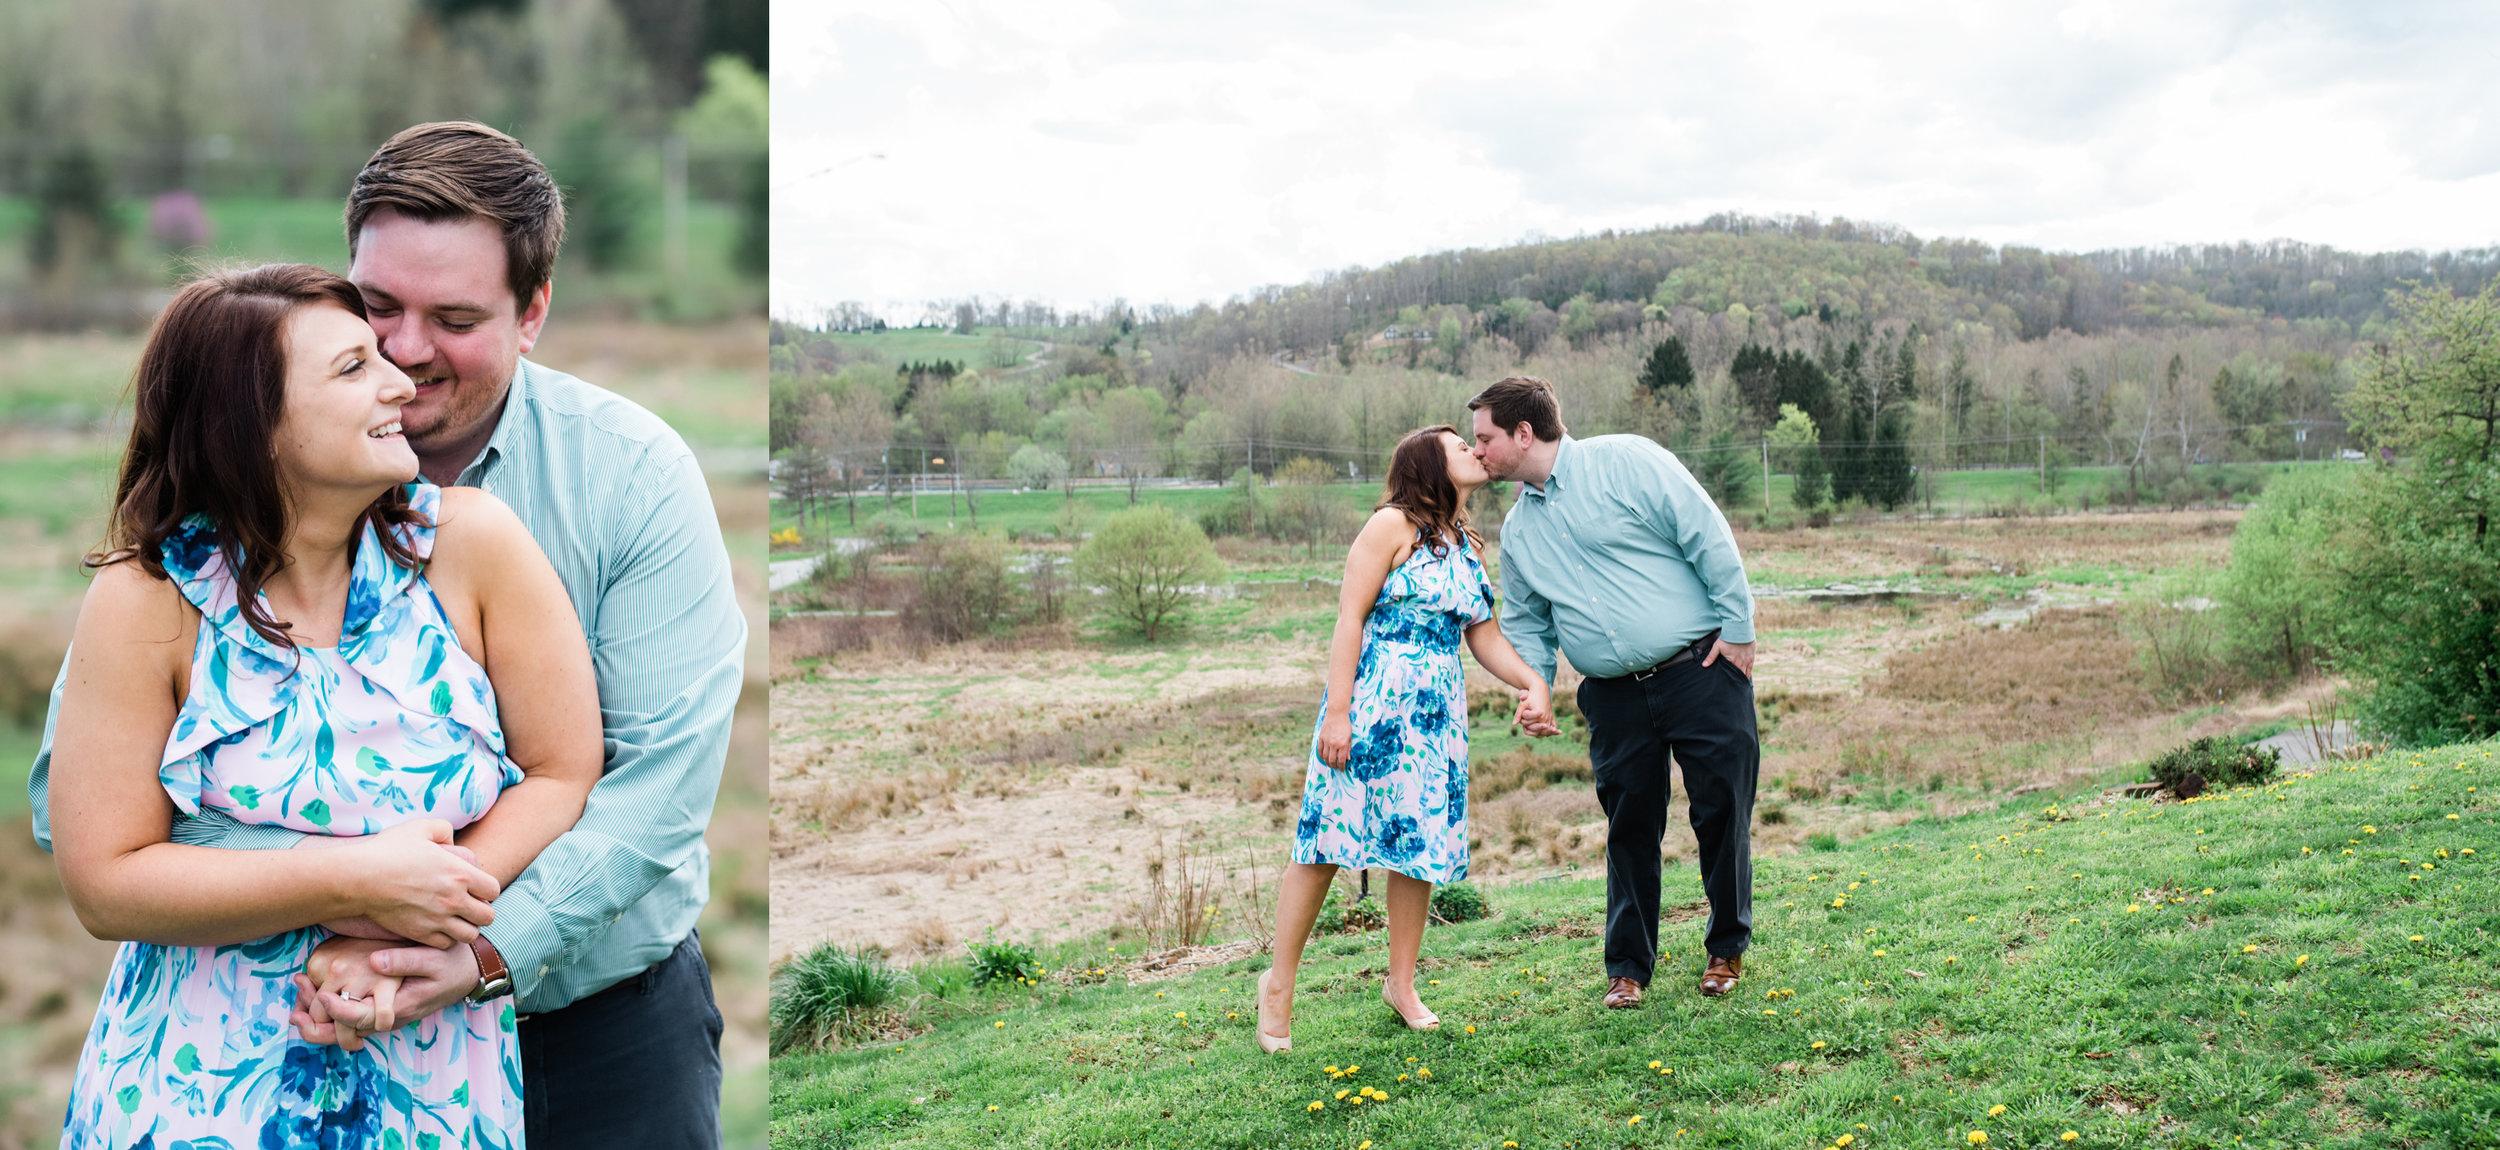 Ligonier engagement photographer, Mariah Fisher Pittsburgh weddings.jpg